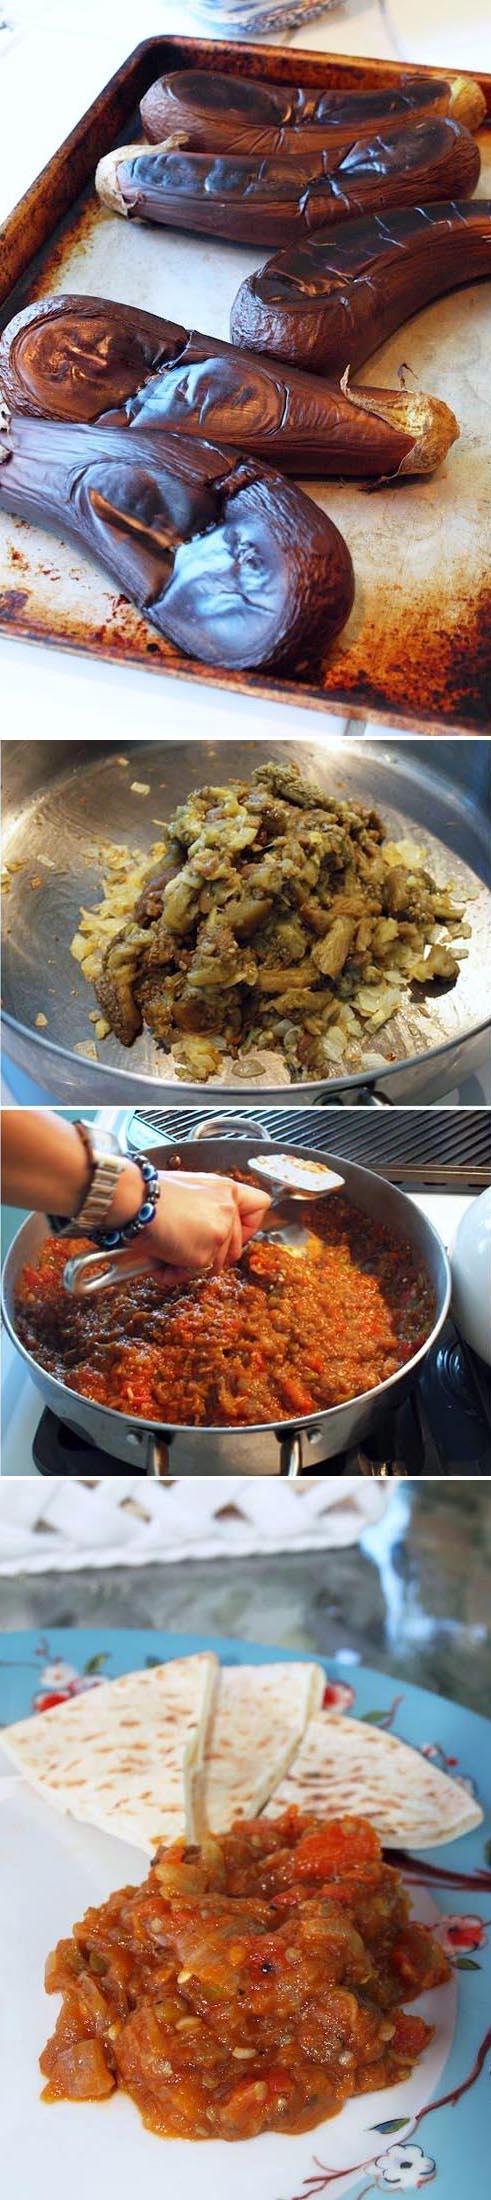 recipe: baklazhannaya ikra russian eggplant caviar [22]